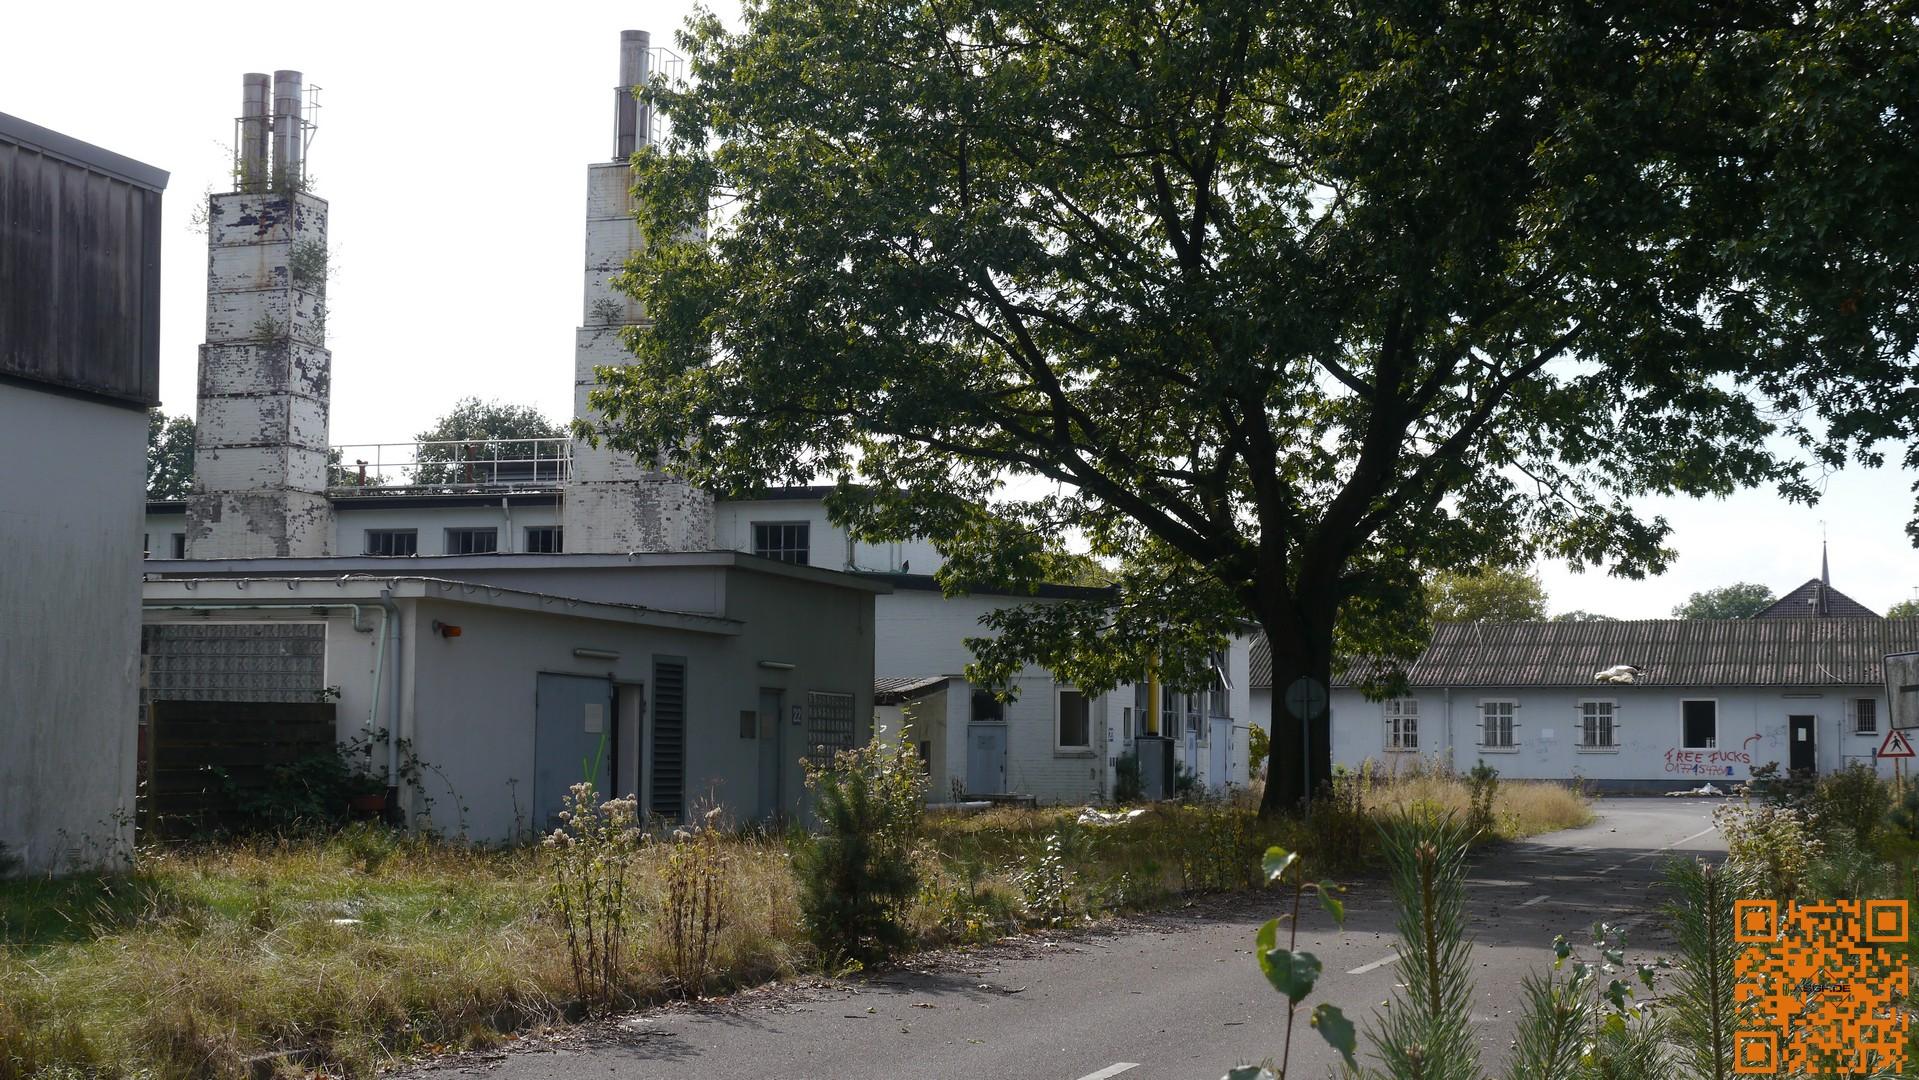 hospital2-17-09-16-26